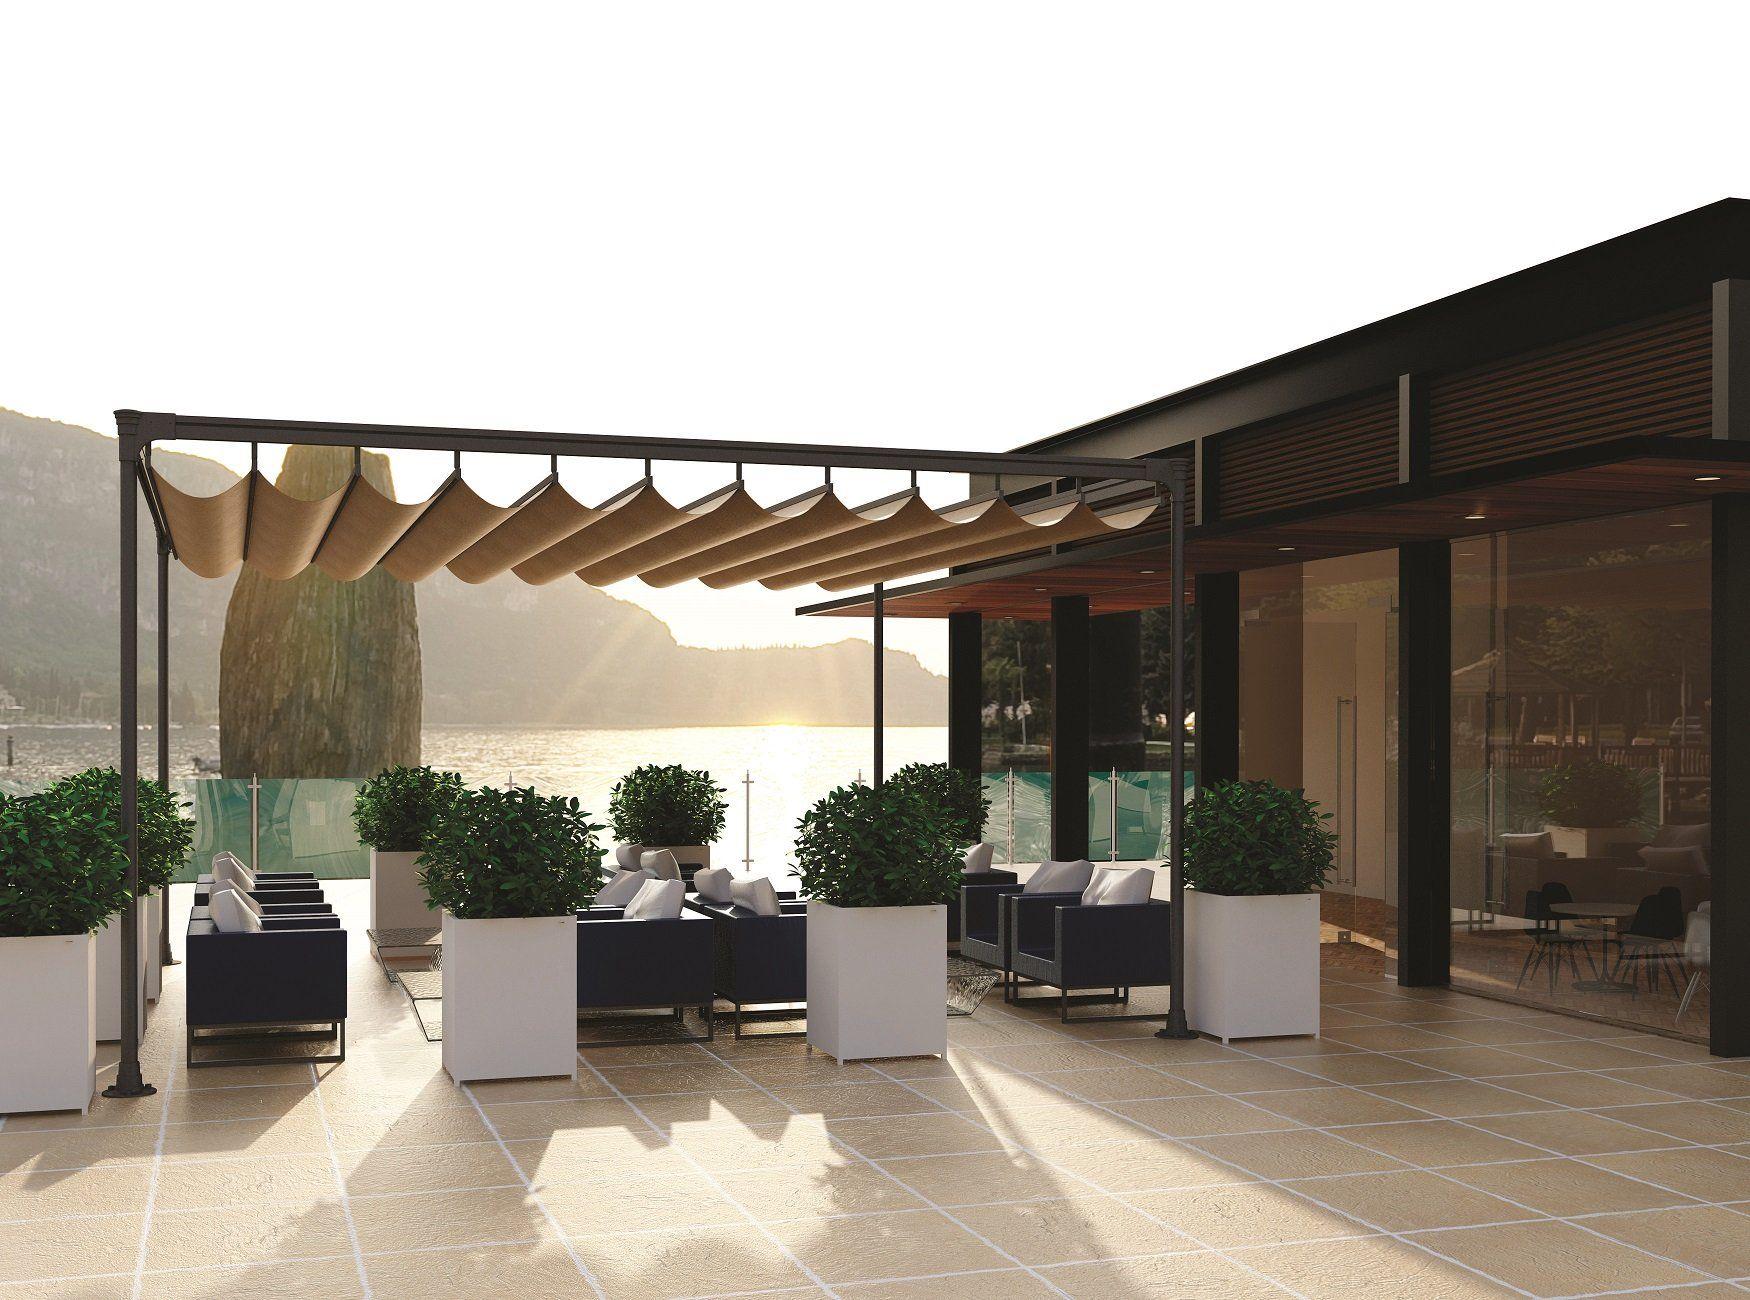 freistehende pergola beschattung 6 meter x 6 meter garten pinterest sonnenschutz terrasse. Black Bedroom Furniture Sets. Home Design Ideas